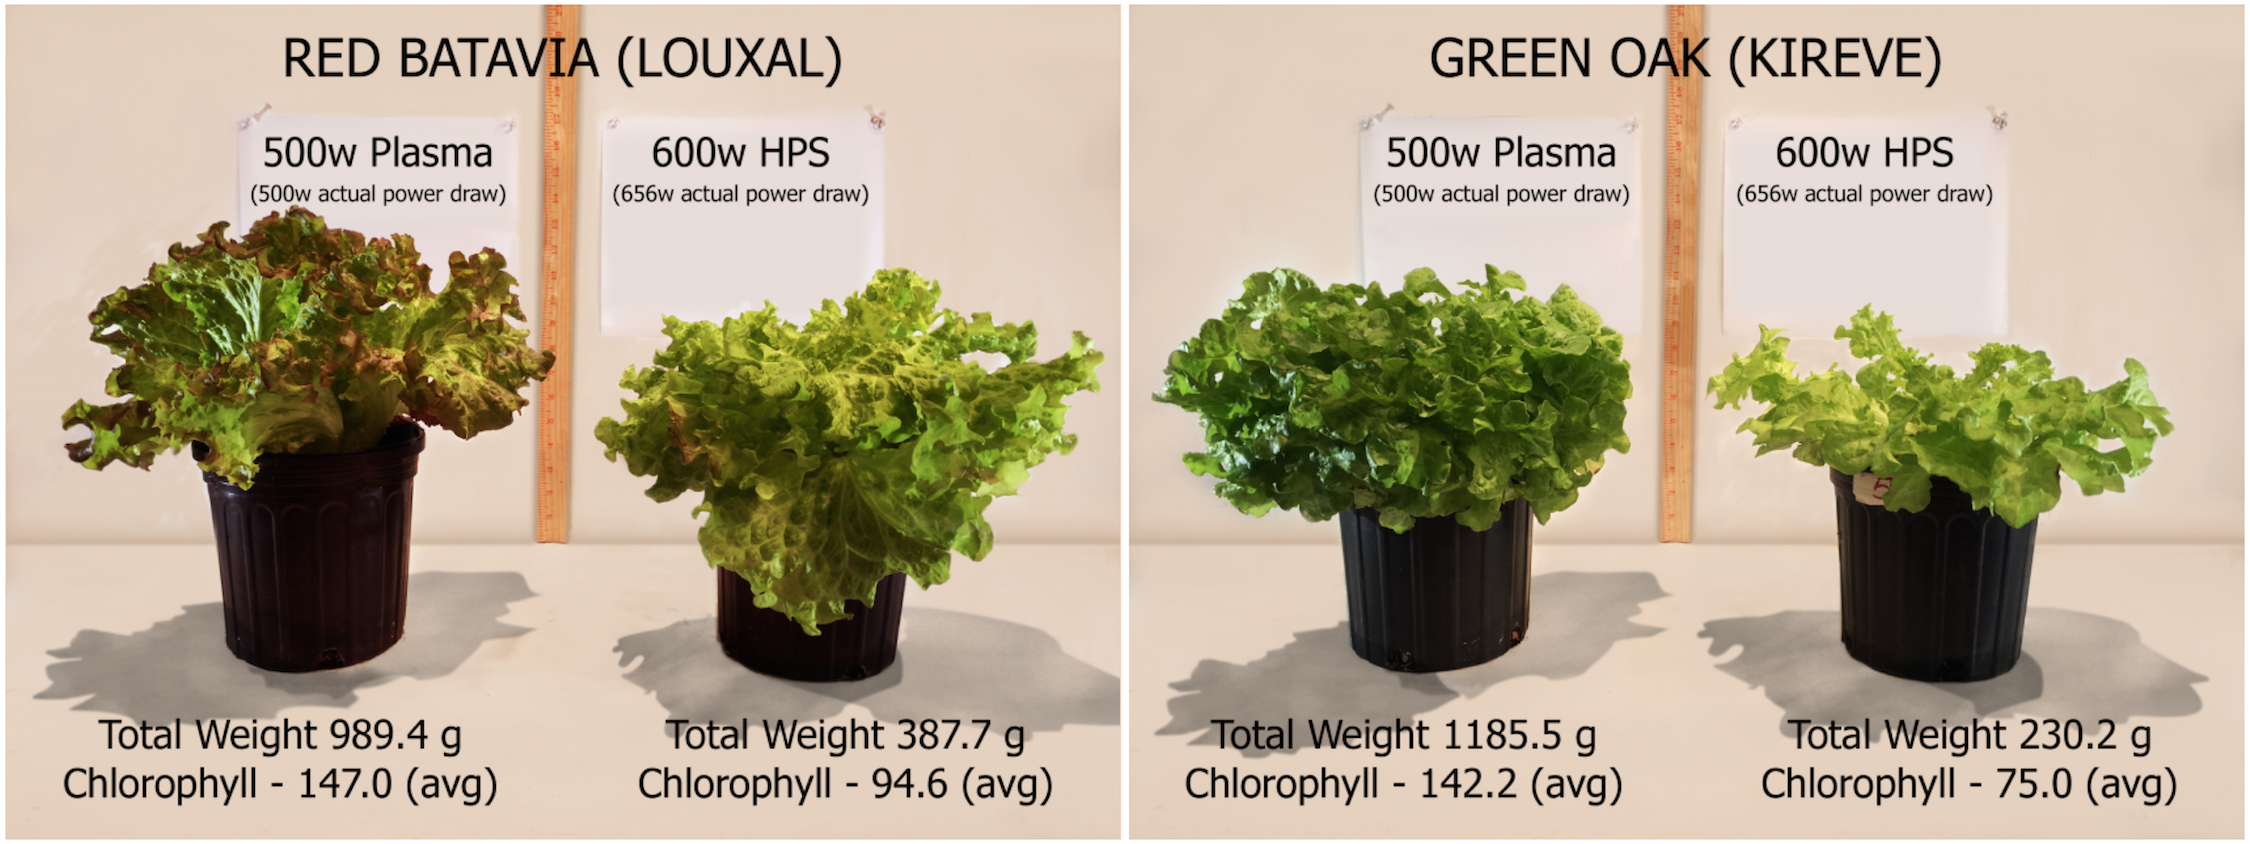 Chameleon® Plasma Grow Lighting Announces New Business Strategies for Plasma Grow Light  110yll